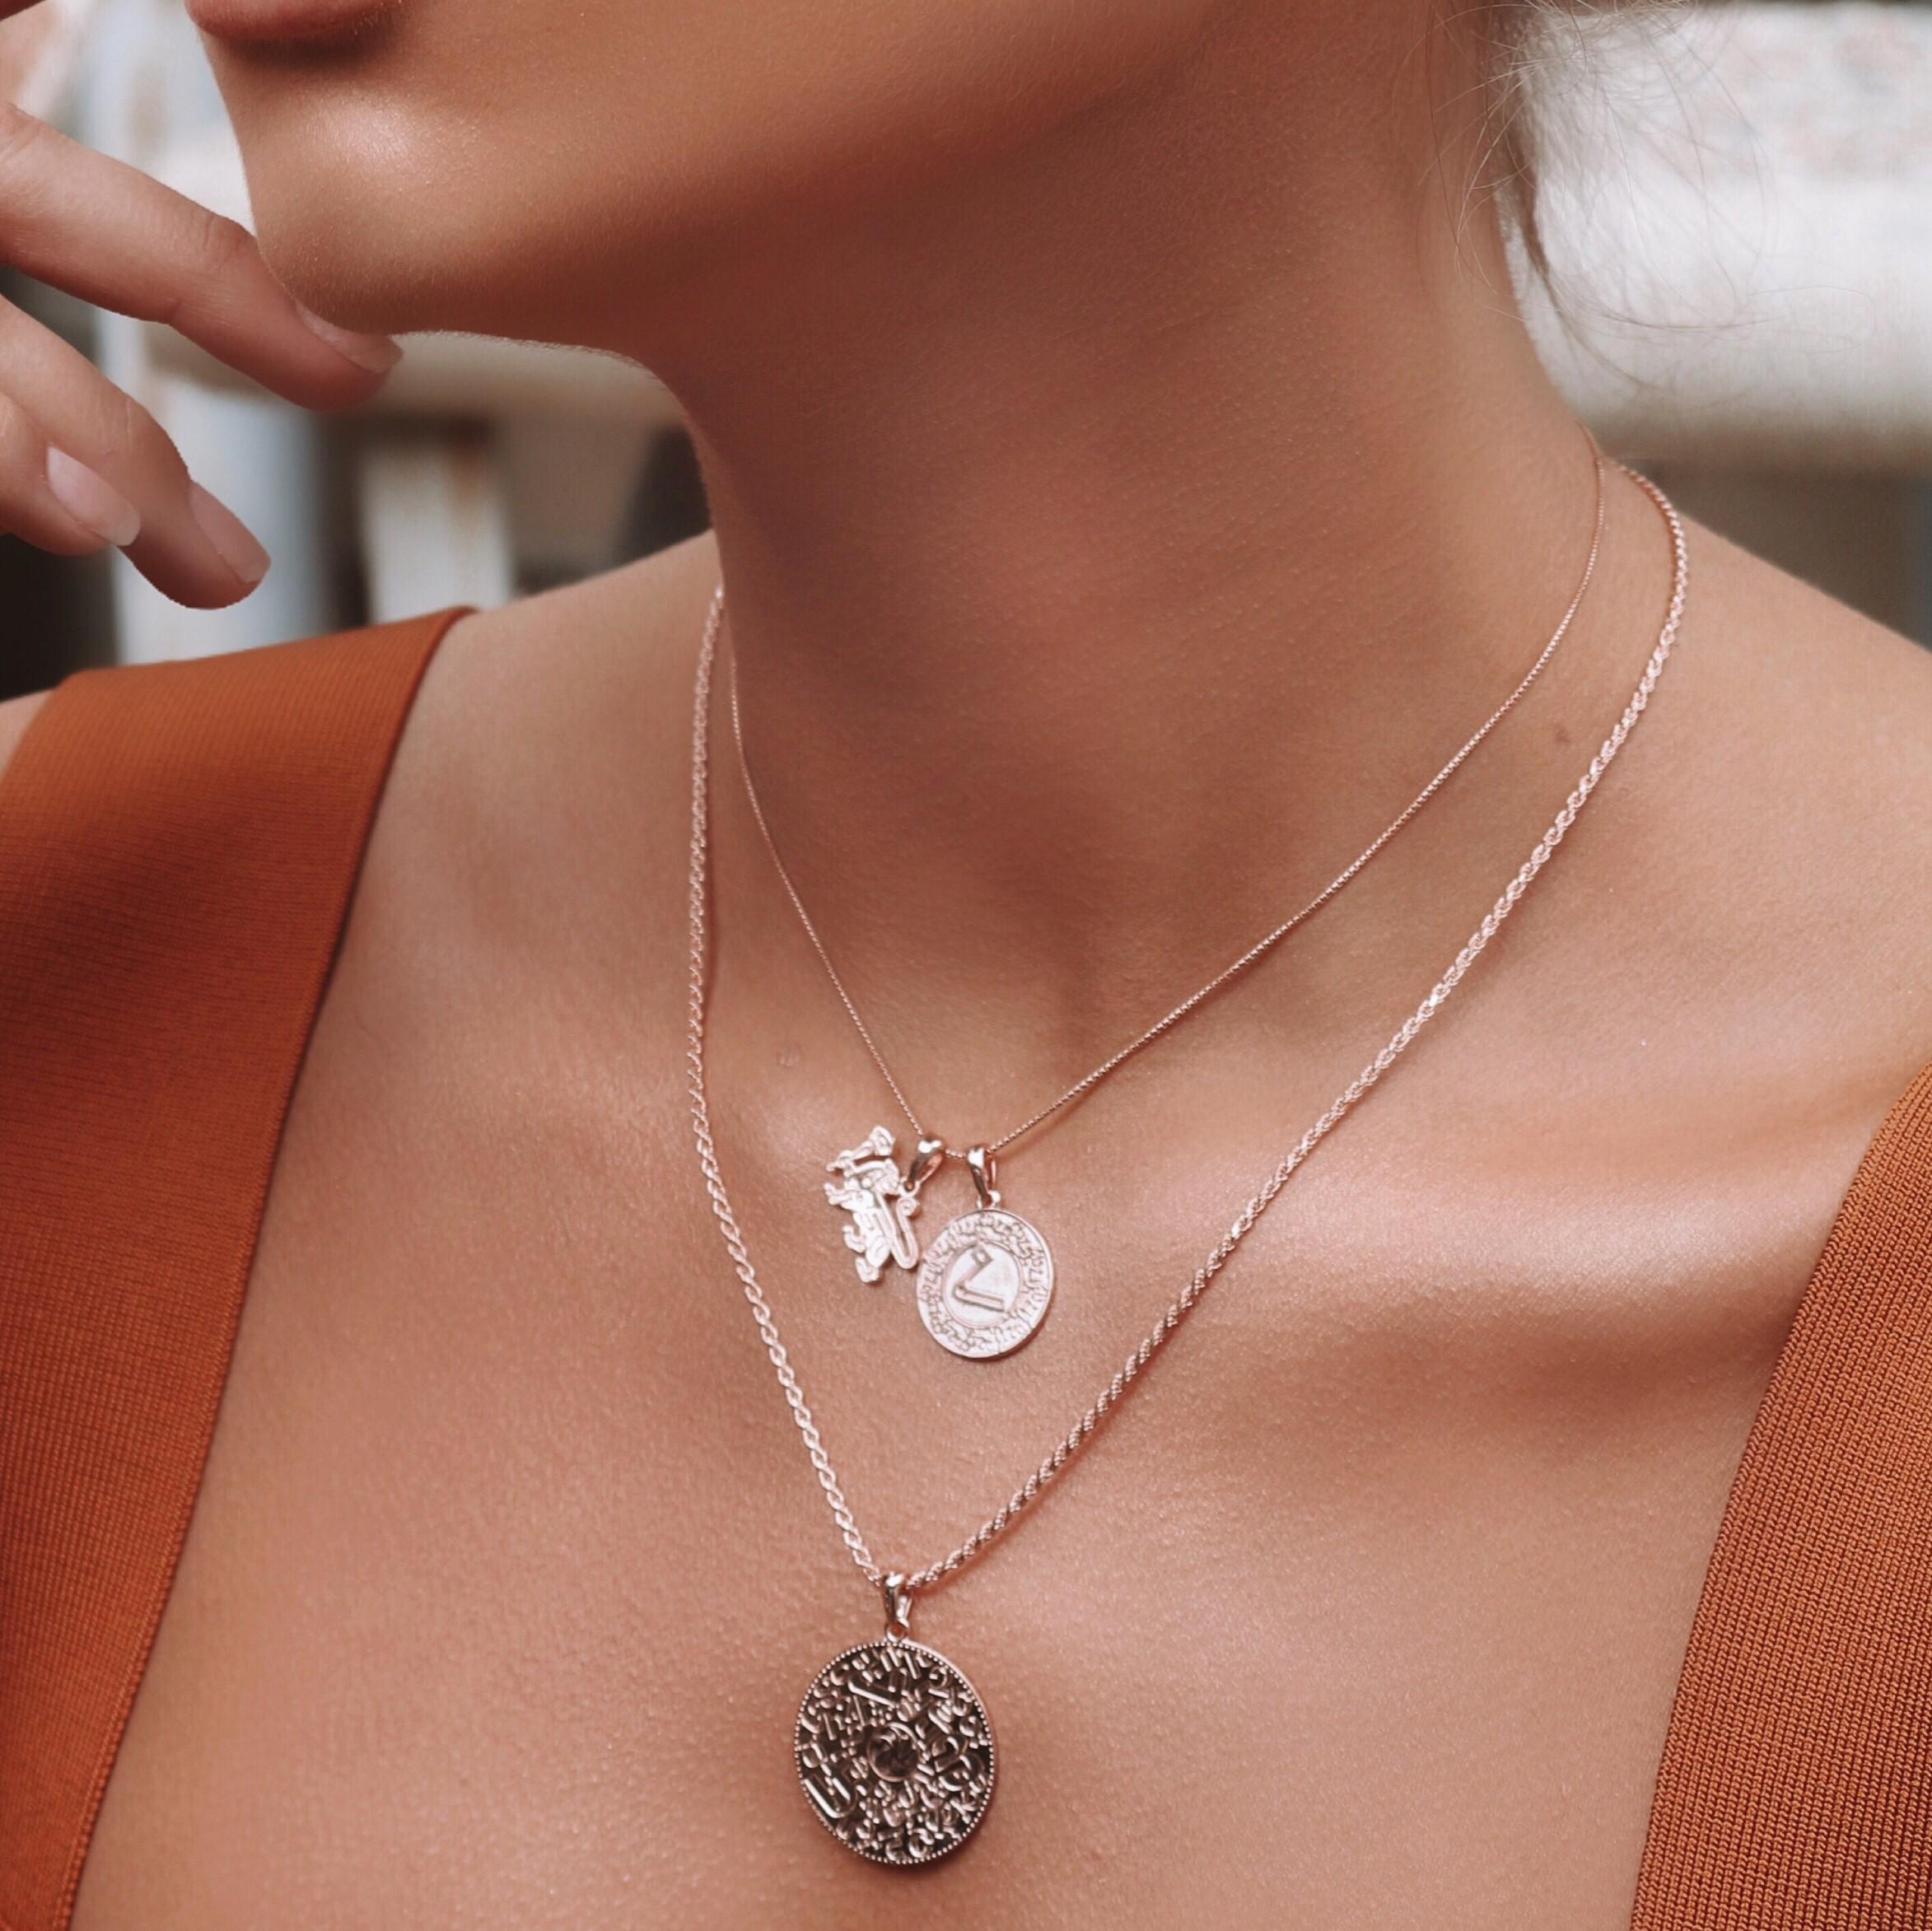 Woman wearing Rose Gold Armenian Alphabet Necklace